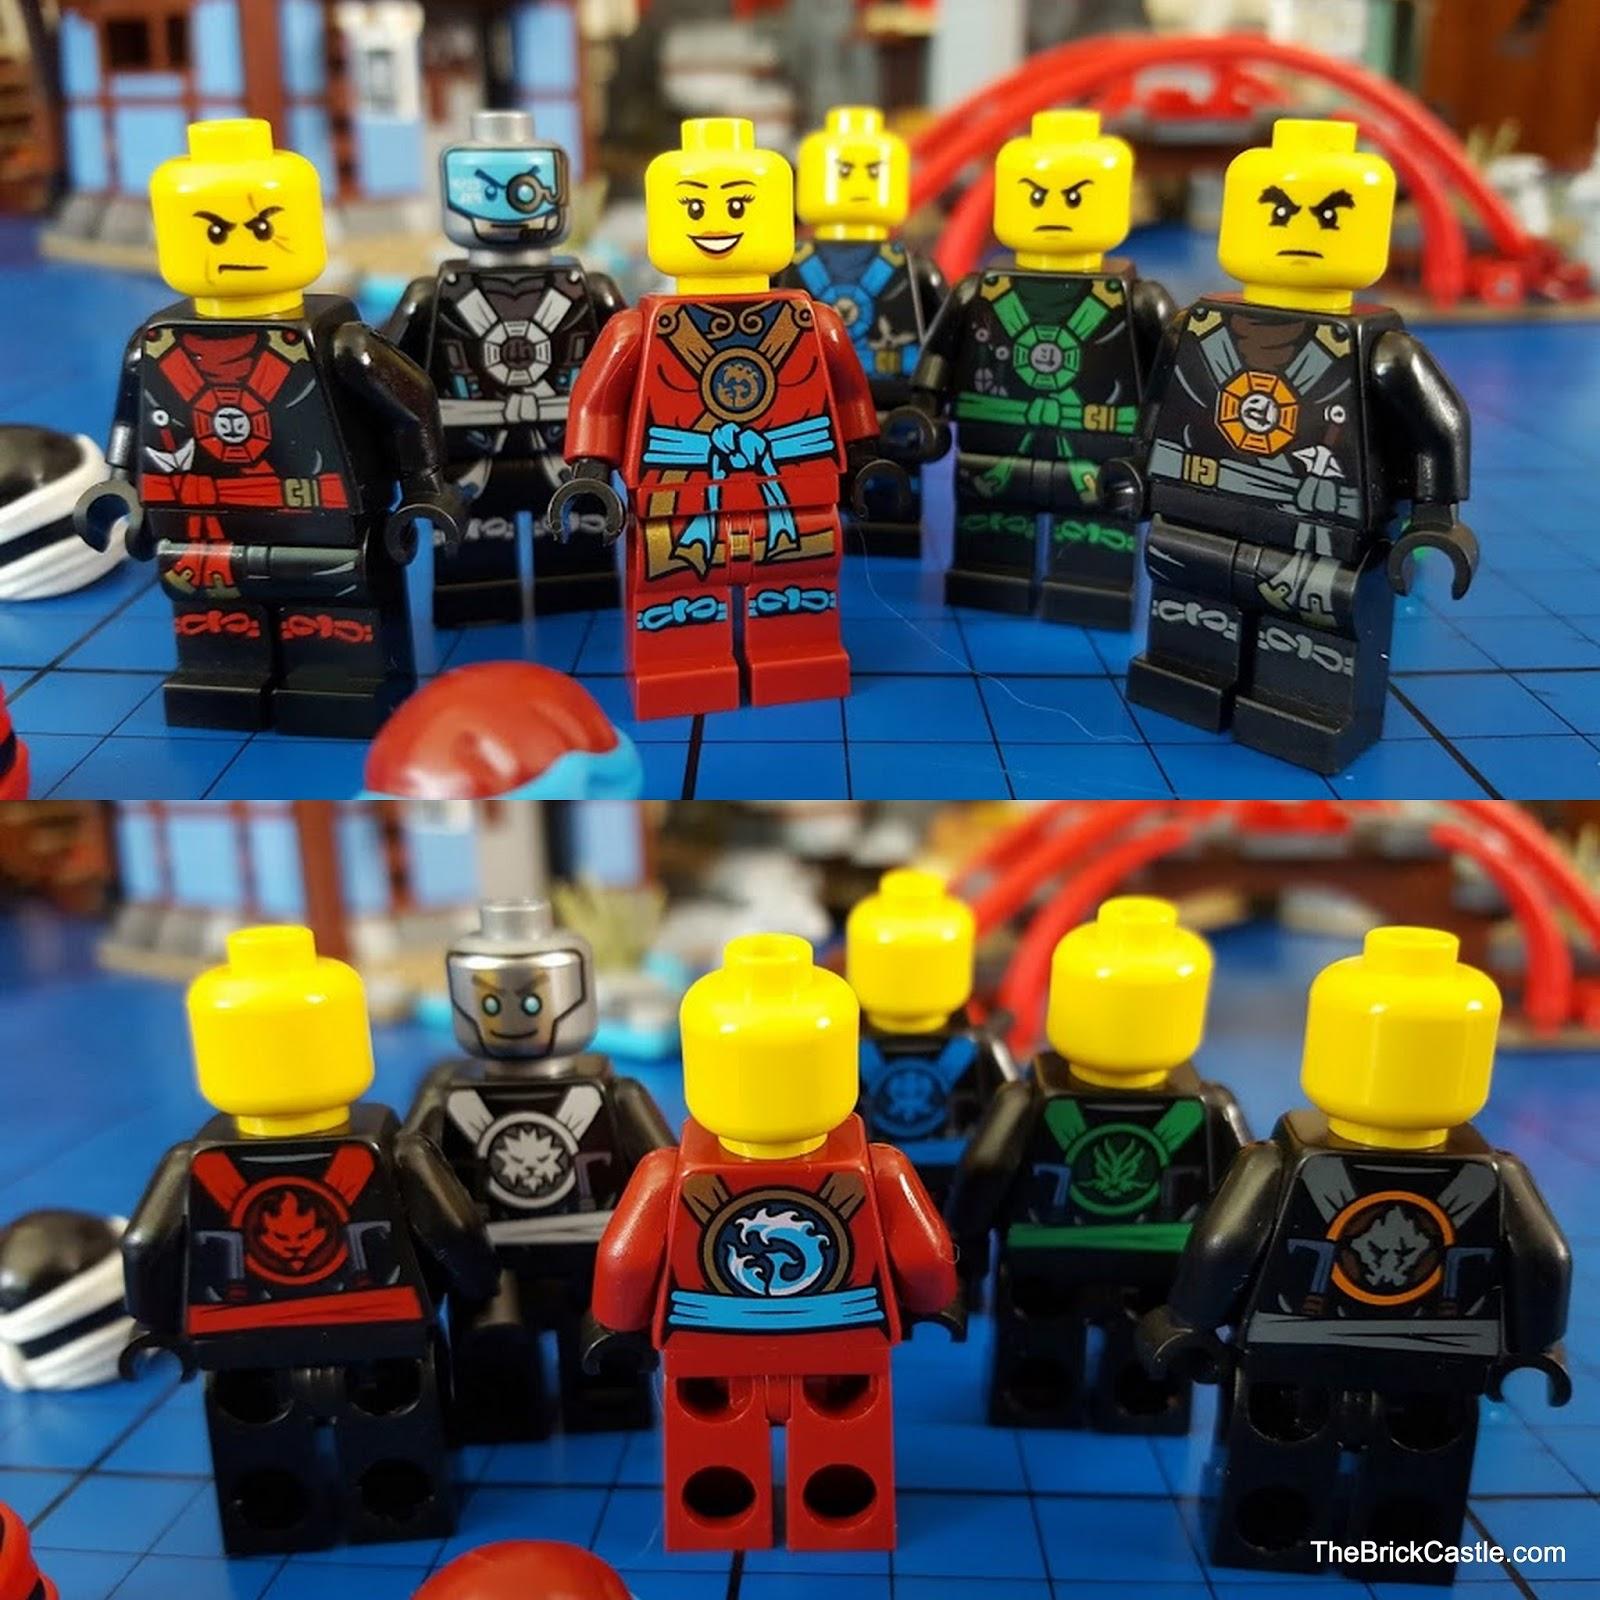 The brick castle lego ninjago temple of airjitzu set 70751 review - Lego ninjago 6 ...